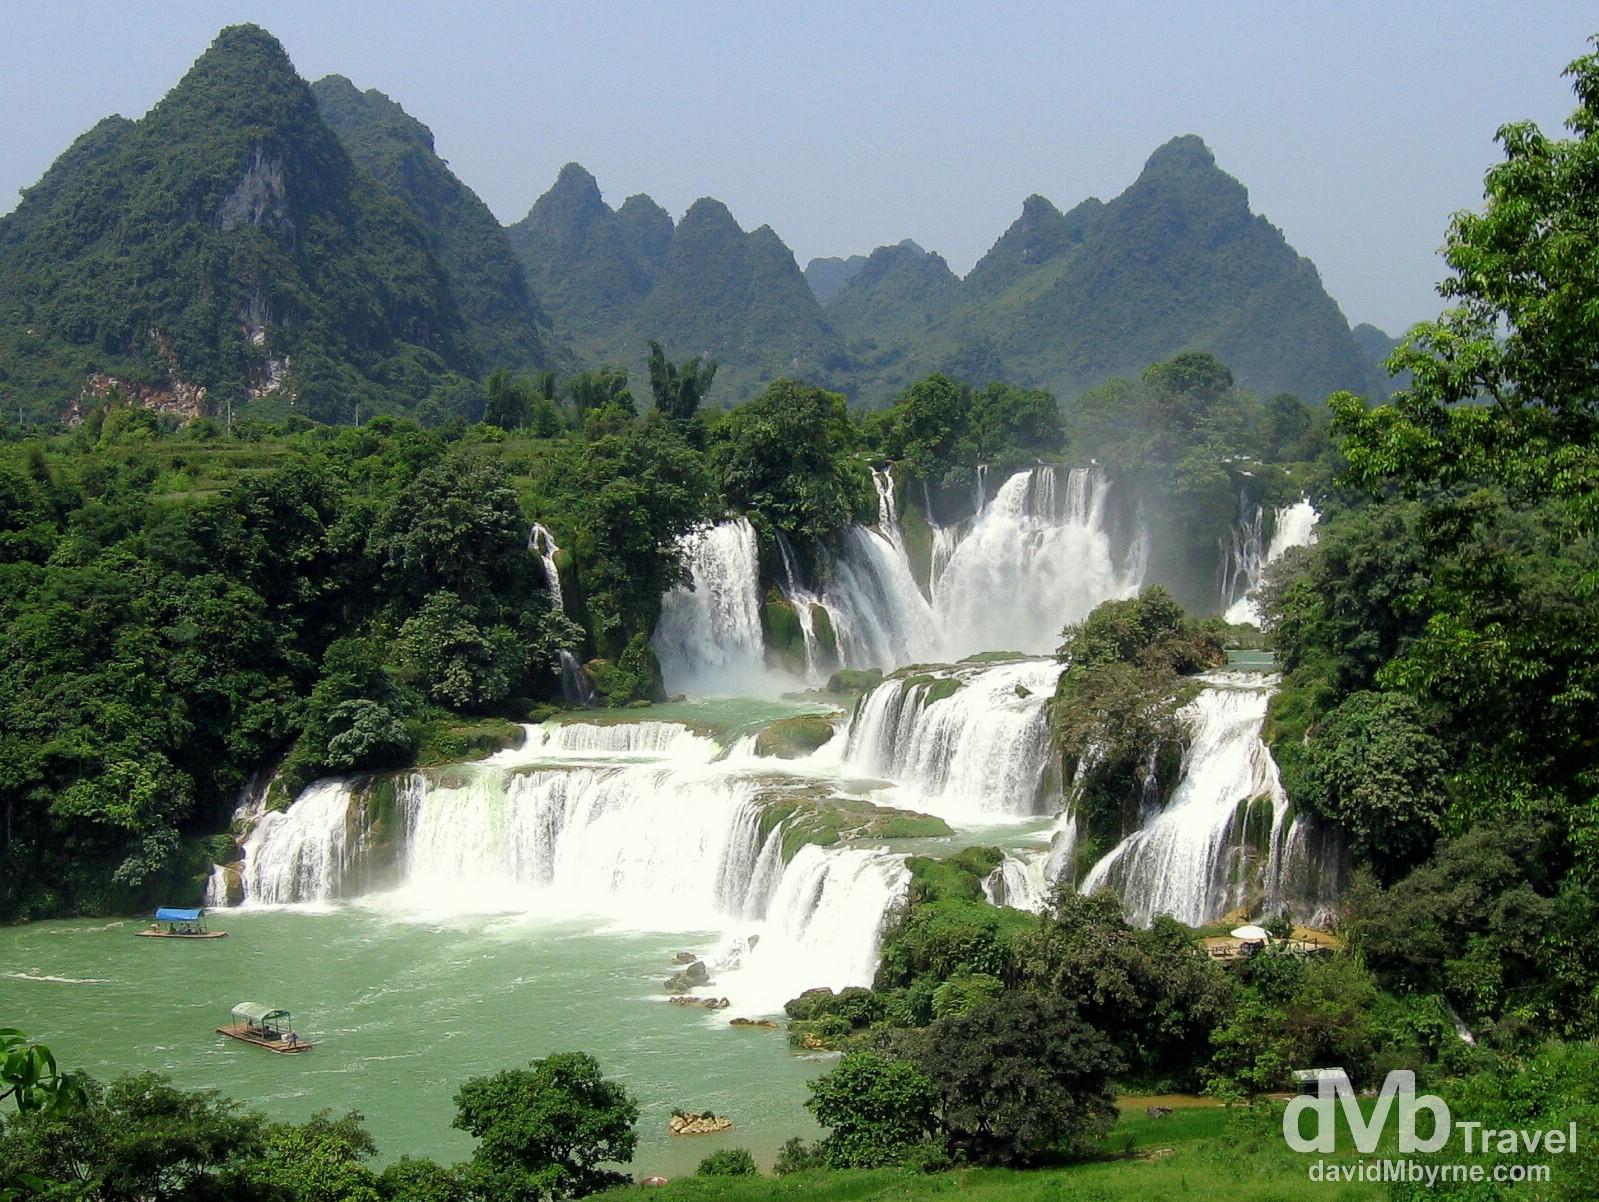 The Detian falls straddling the China-Vietnam border, near Shuolong, southwest China. September 1, 2005.